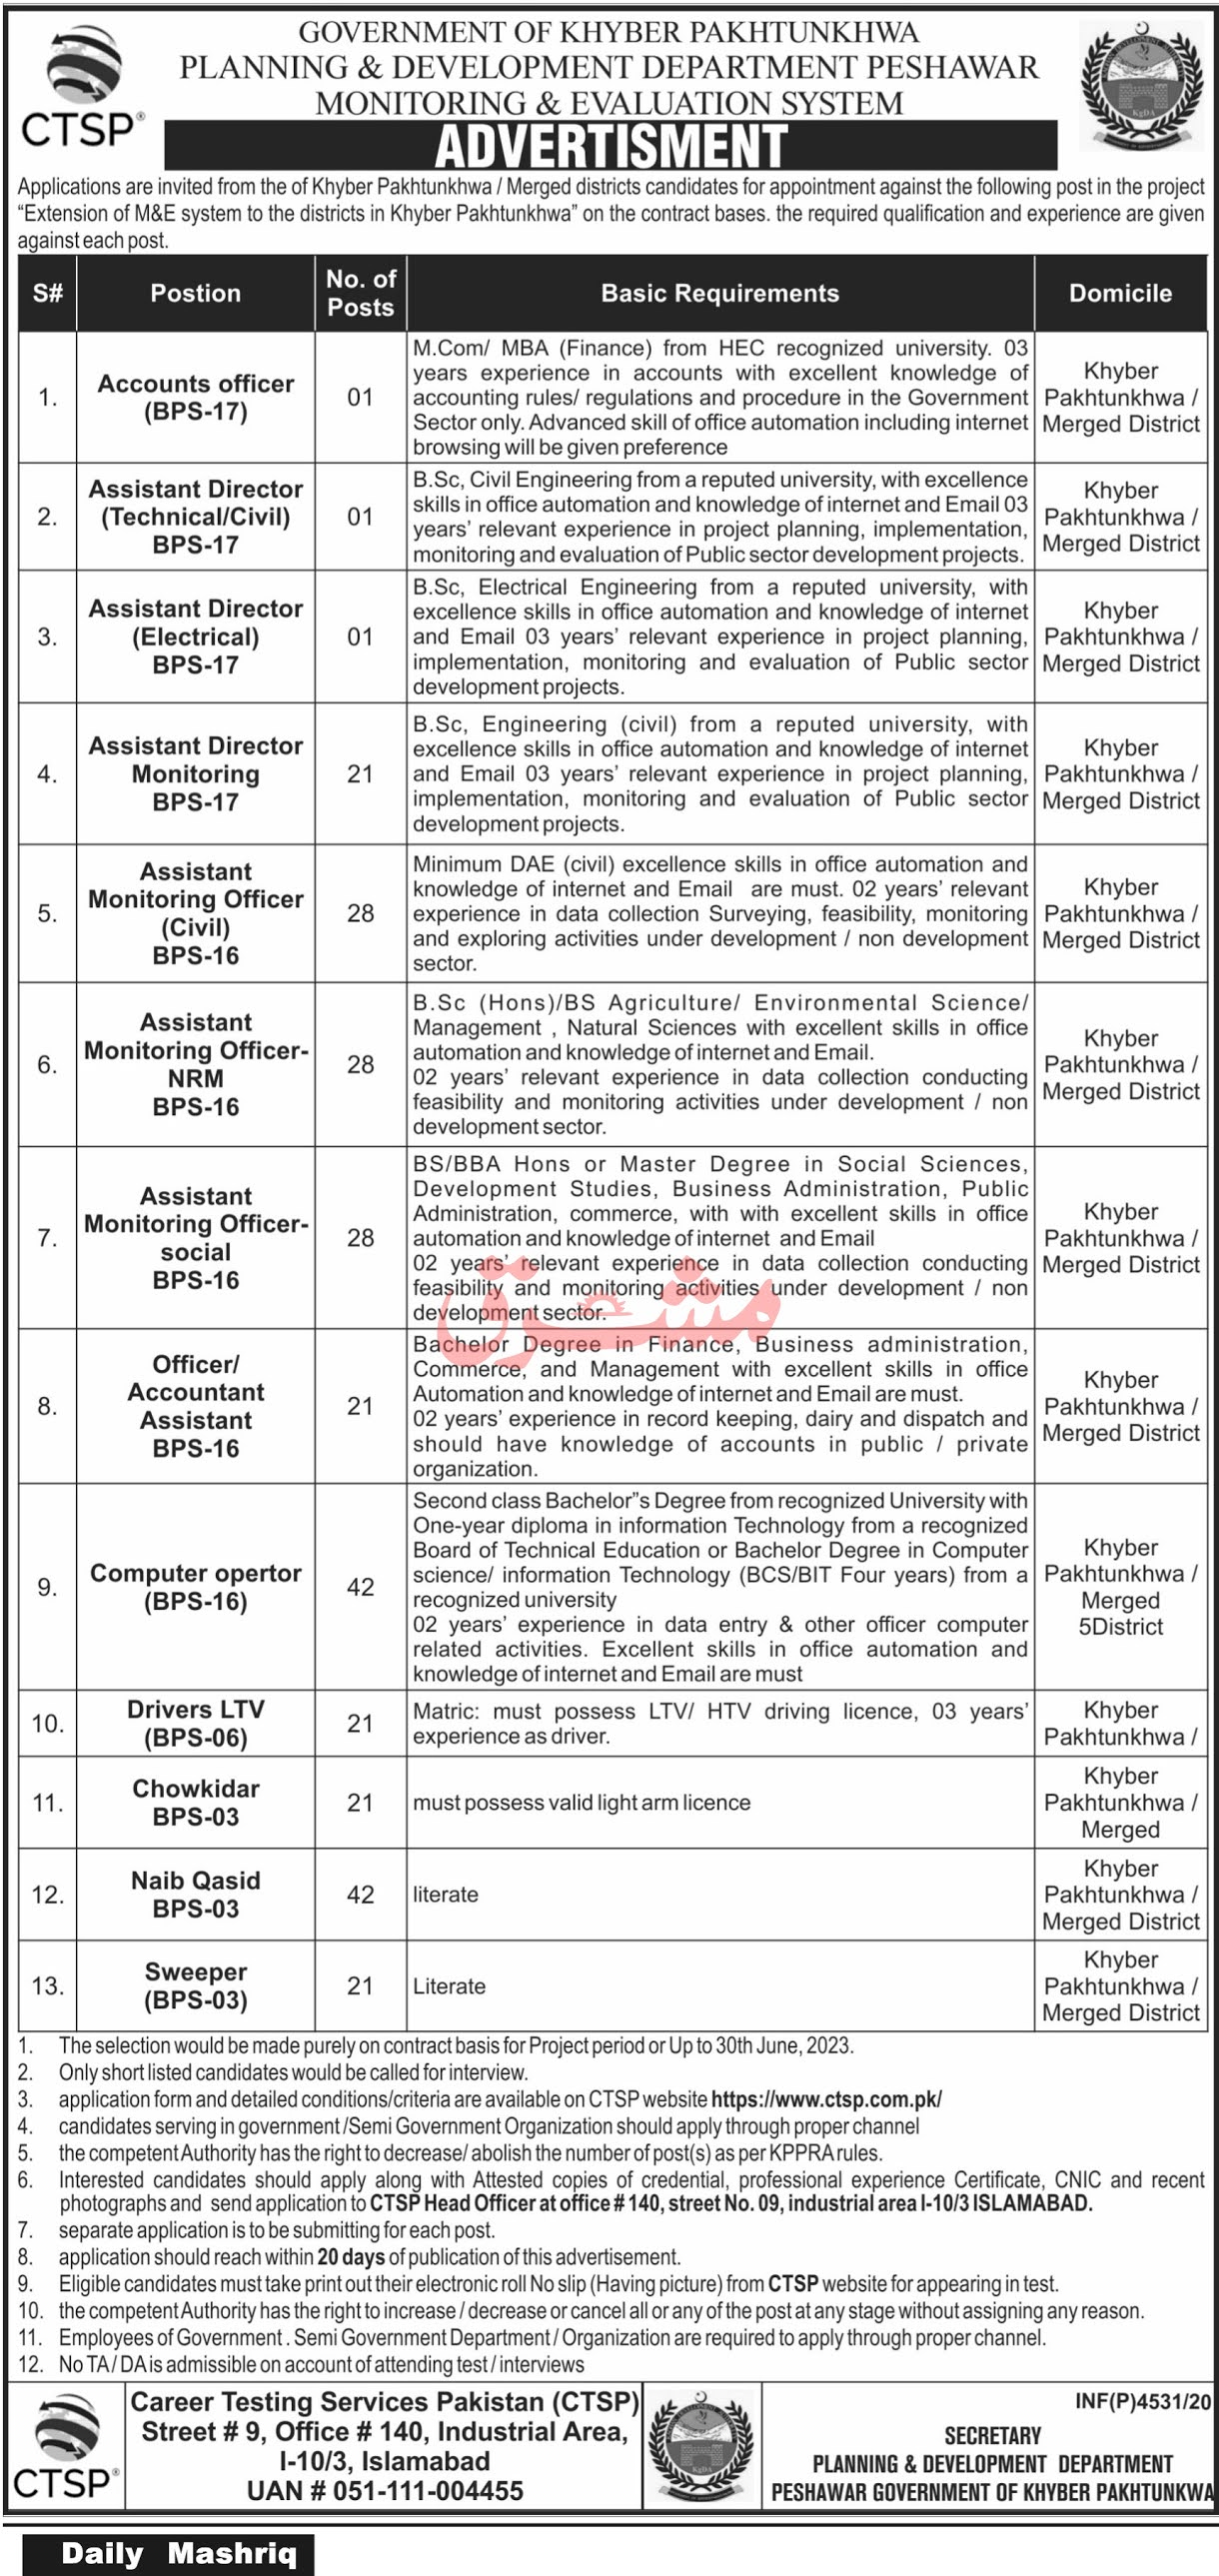 Planning & Development Department KPK Latest Dec 2020 Jobs in Pakistan 2020 - Download Job Application Form - www.ctsp.com.pk